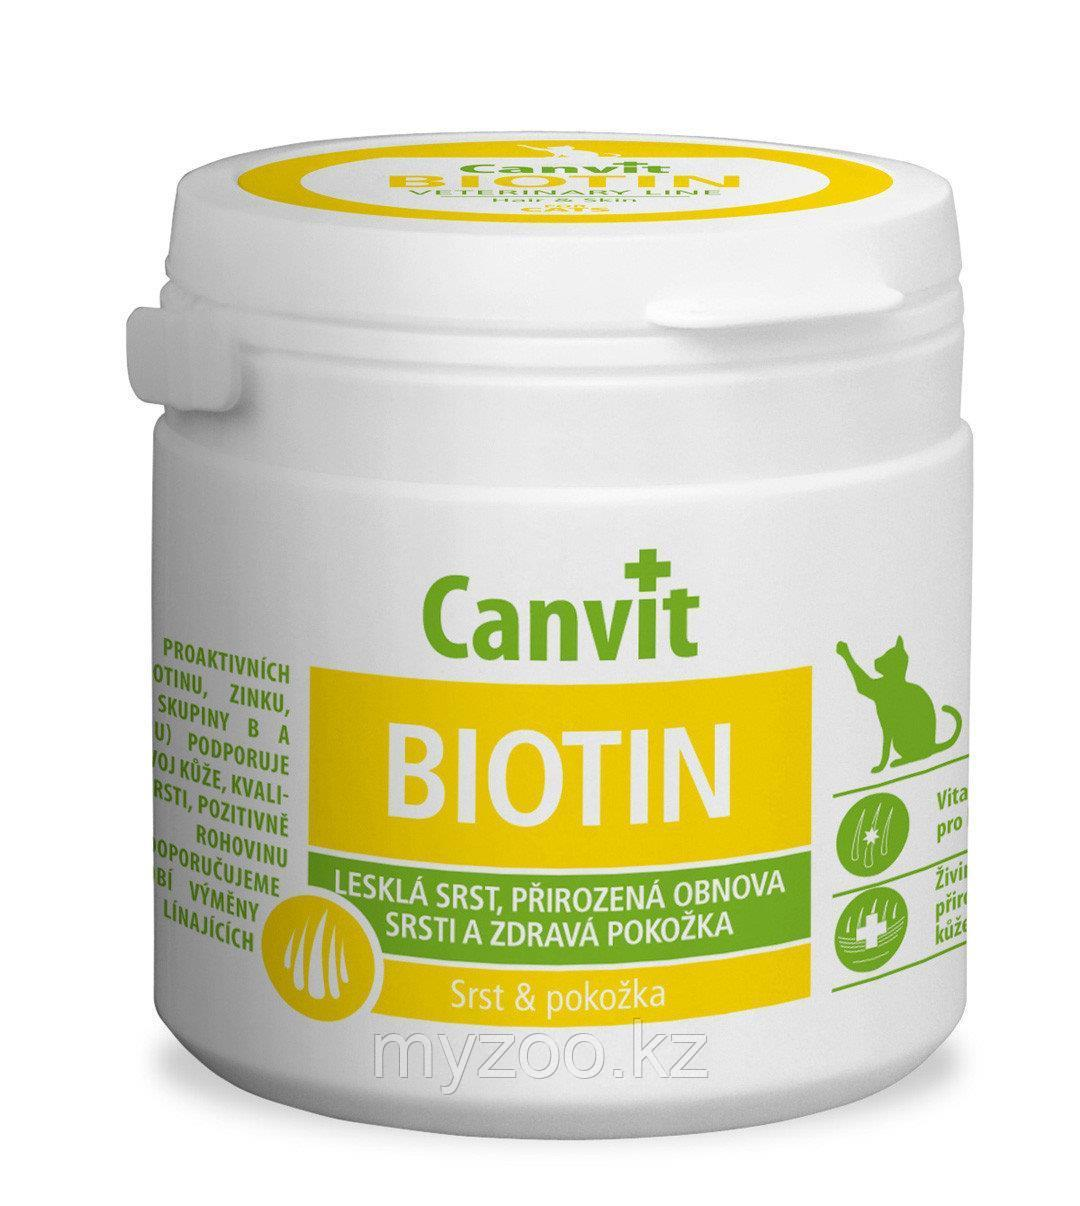 Canvit Biotin,Канвит биотин витамины для кошек 100 тб